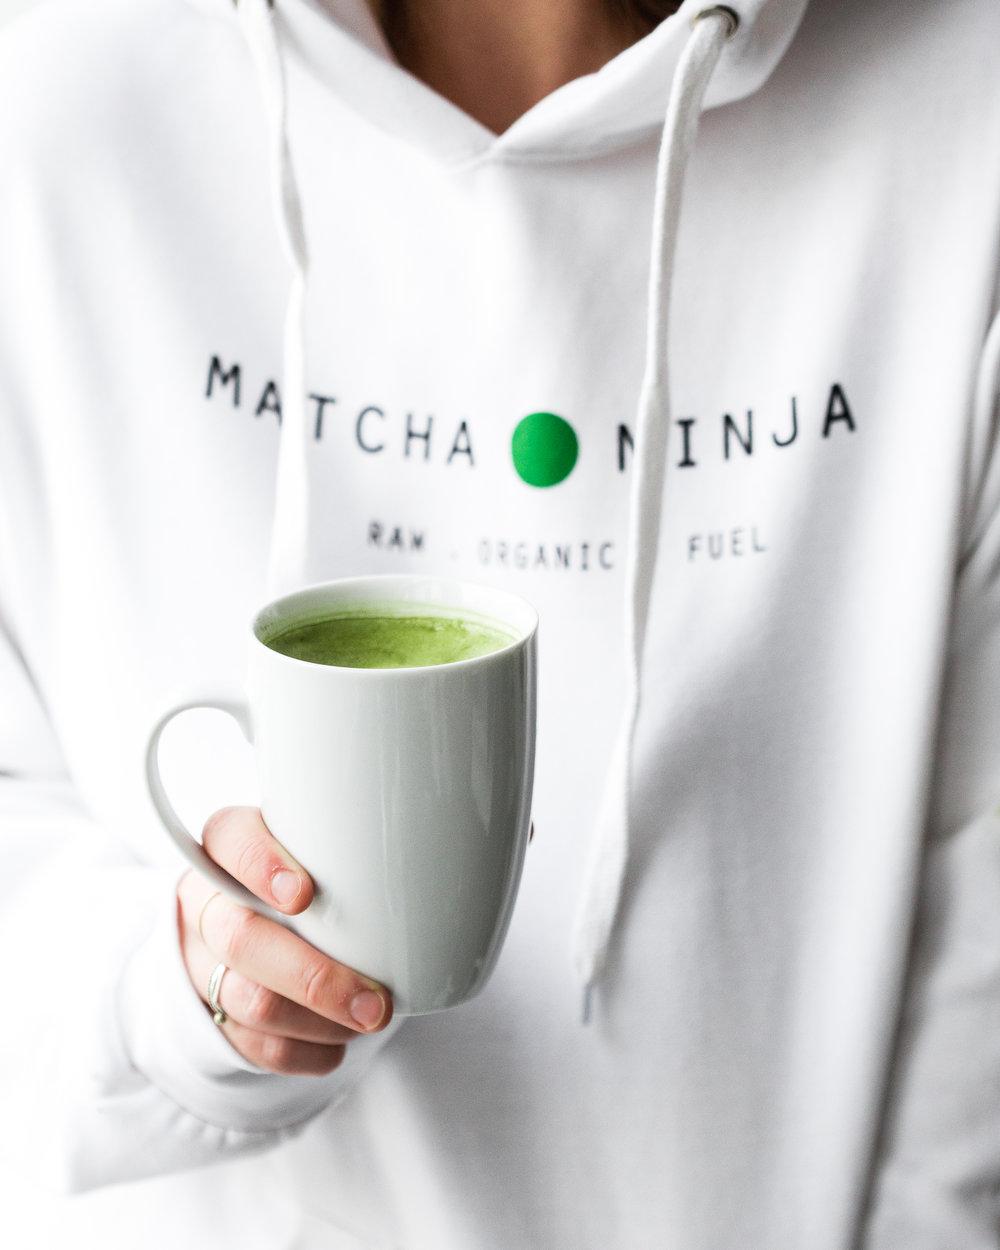 sleep better with matcha